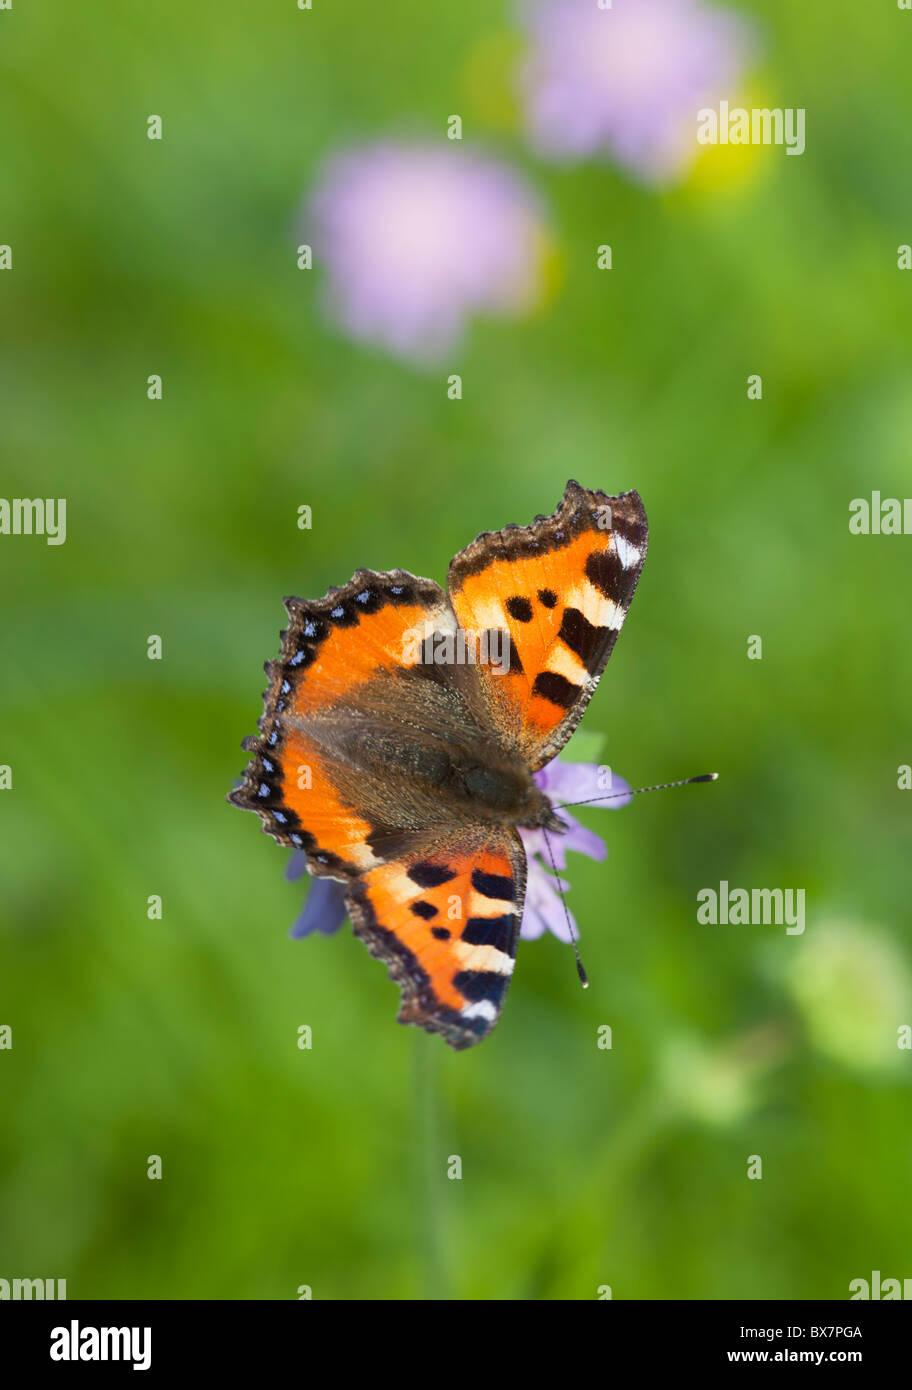 Pequeña tortoiseshell ( Aglais urticae , Nymphalidae , Nymphalinae ) mariposa chupar néctar de un thrift ( Armeria maritima ) , Finlandia Foto de stock